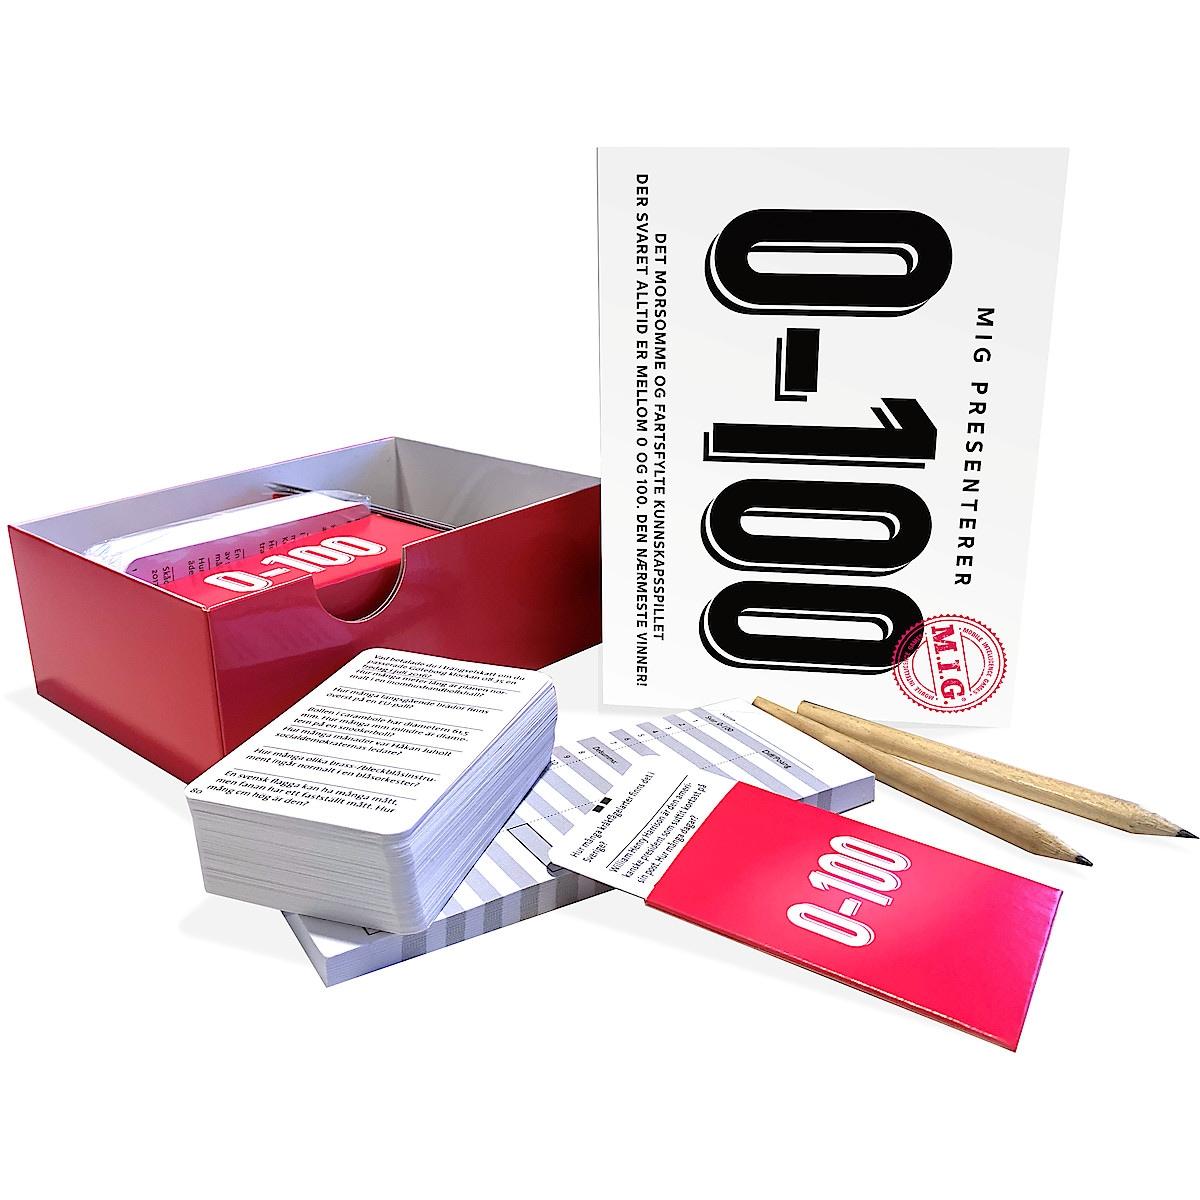 MIG 0-100 spørrespill